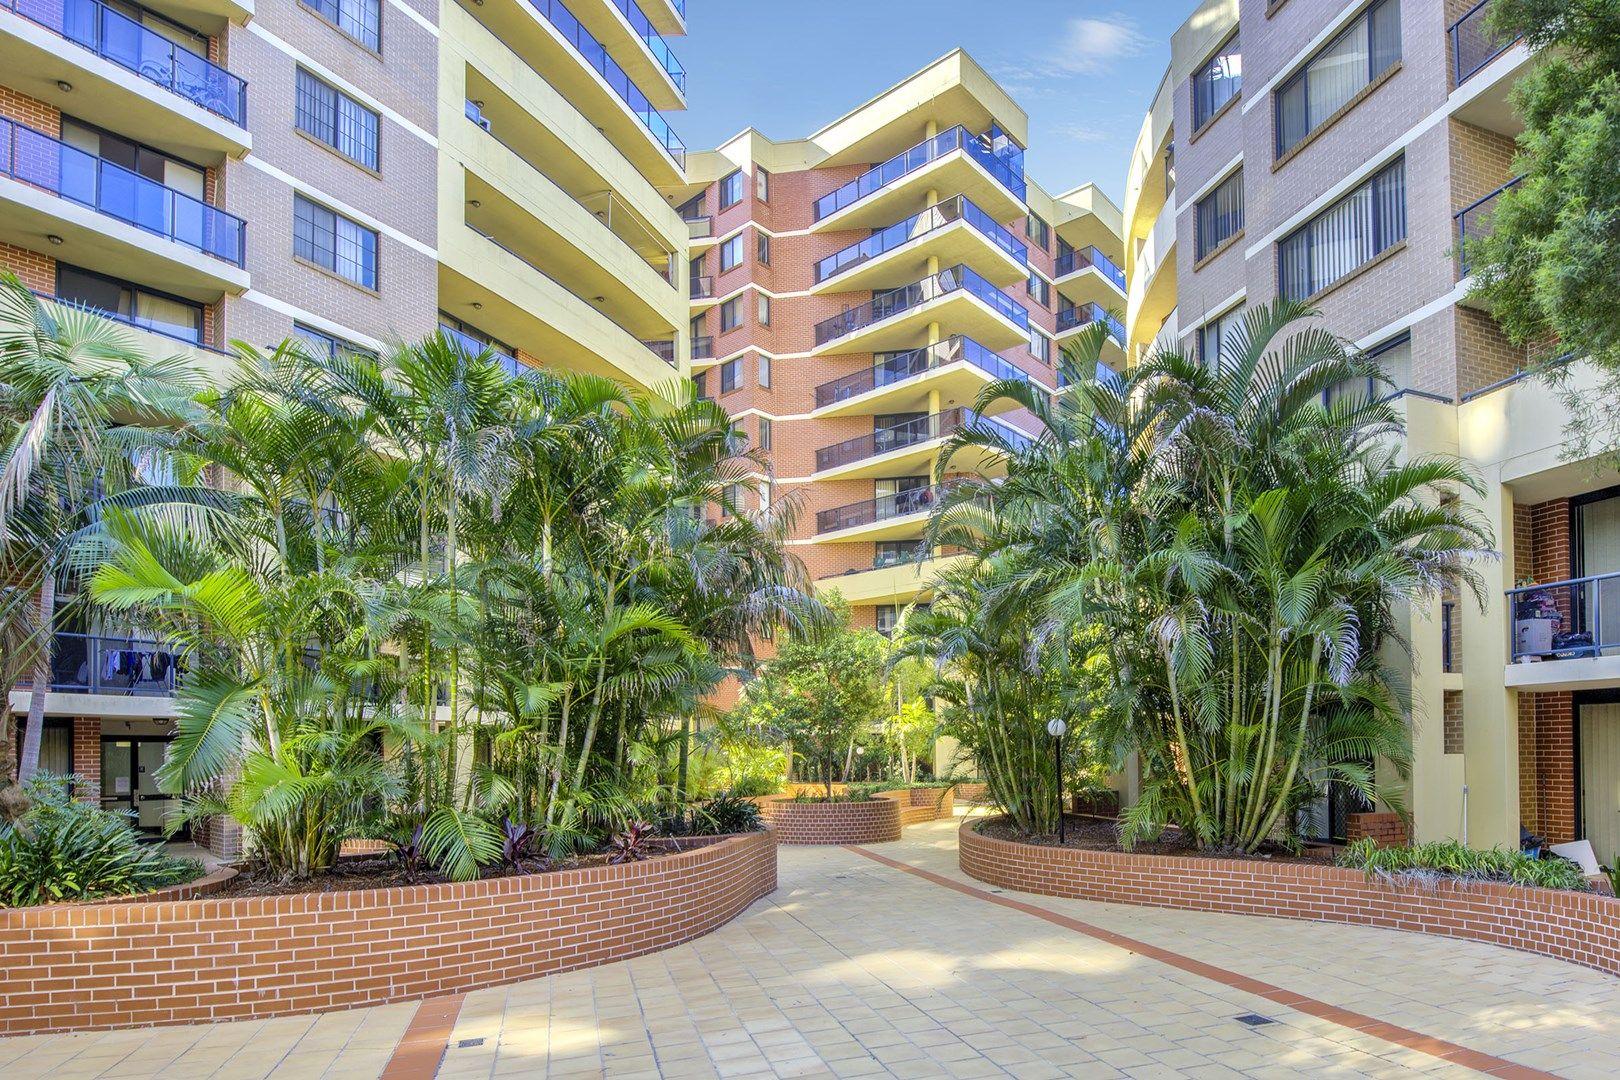 87/1-3 Beresford Road, Strathfield NSW 2135, Image 0